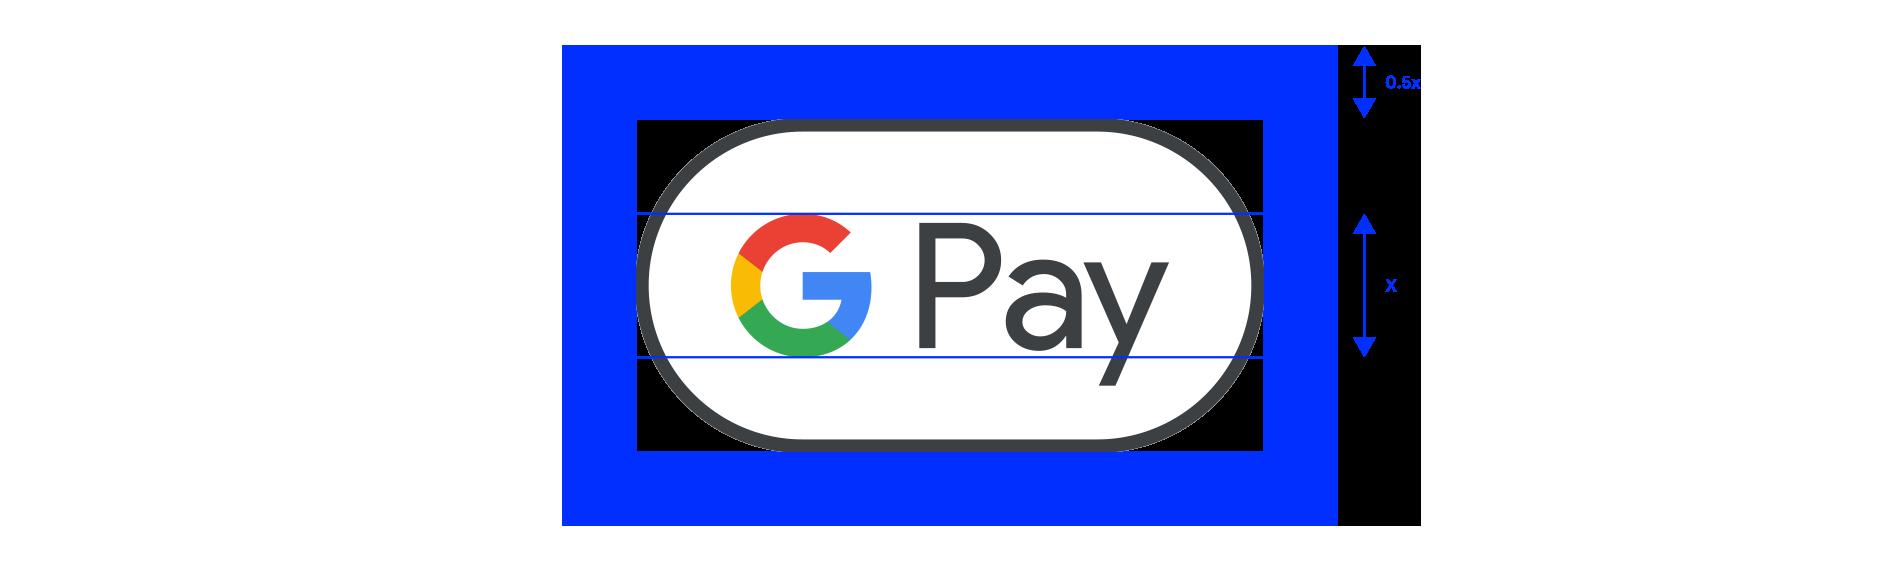 Google Pay 표시 여백 예시